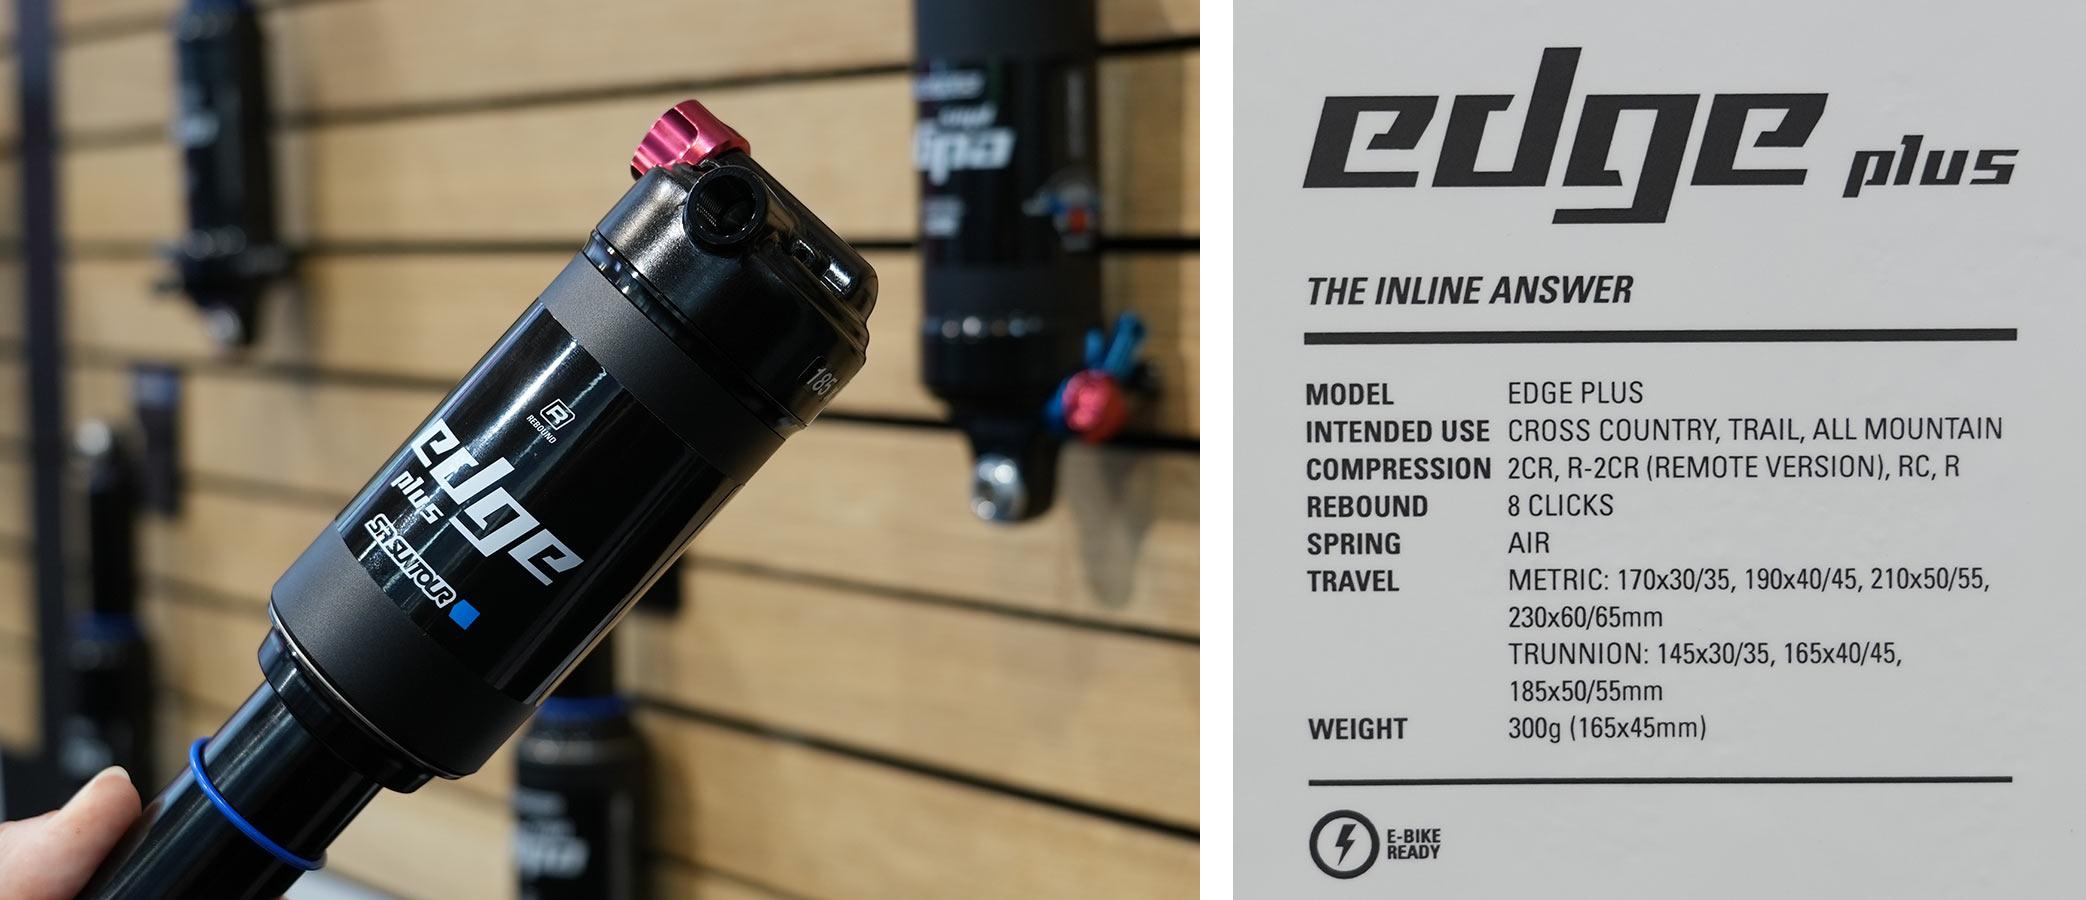 2022 sr suntour edge plus high volume inline rear shock for XC and light trail bikes